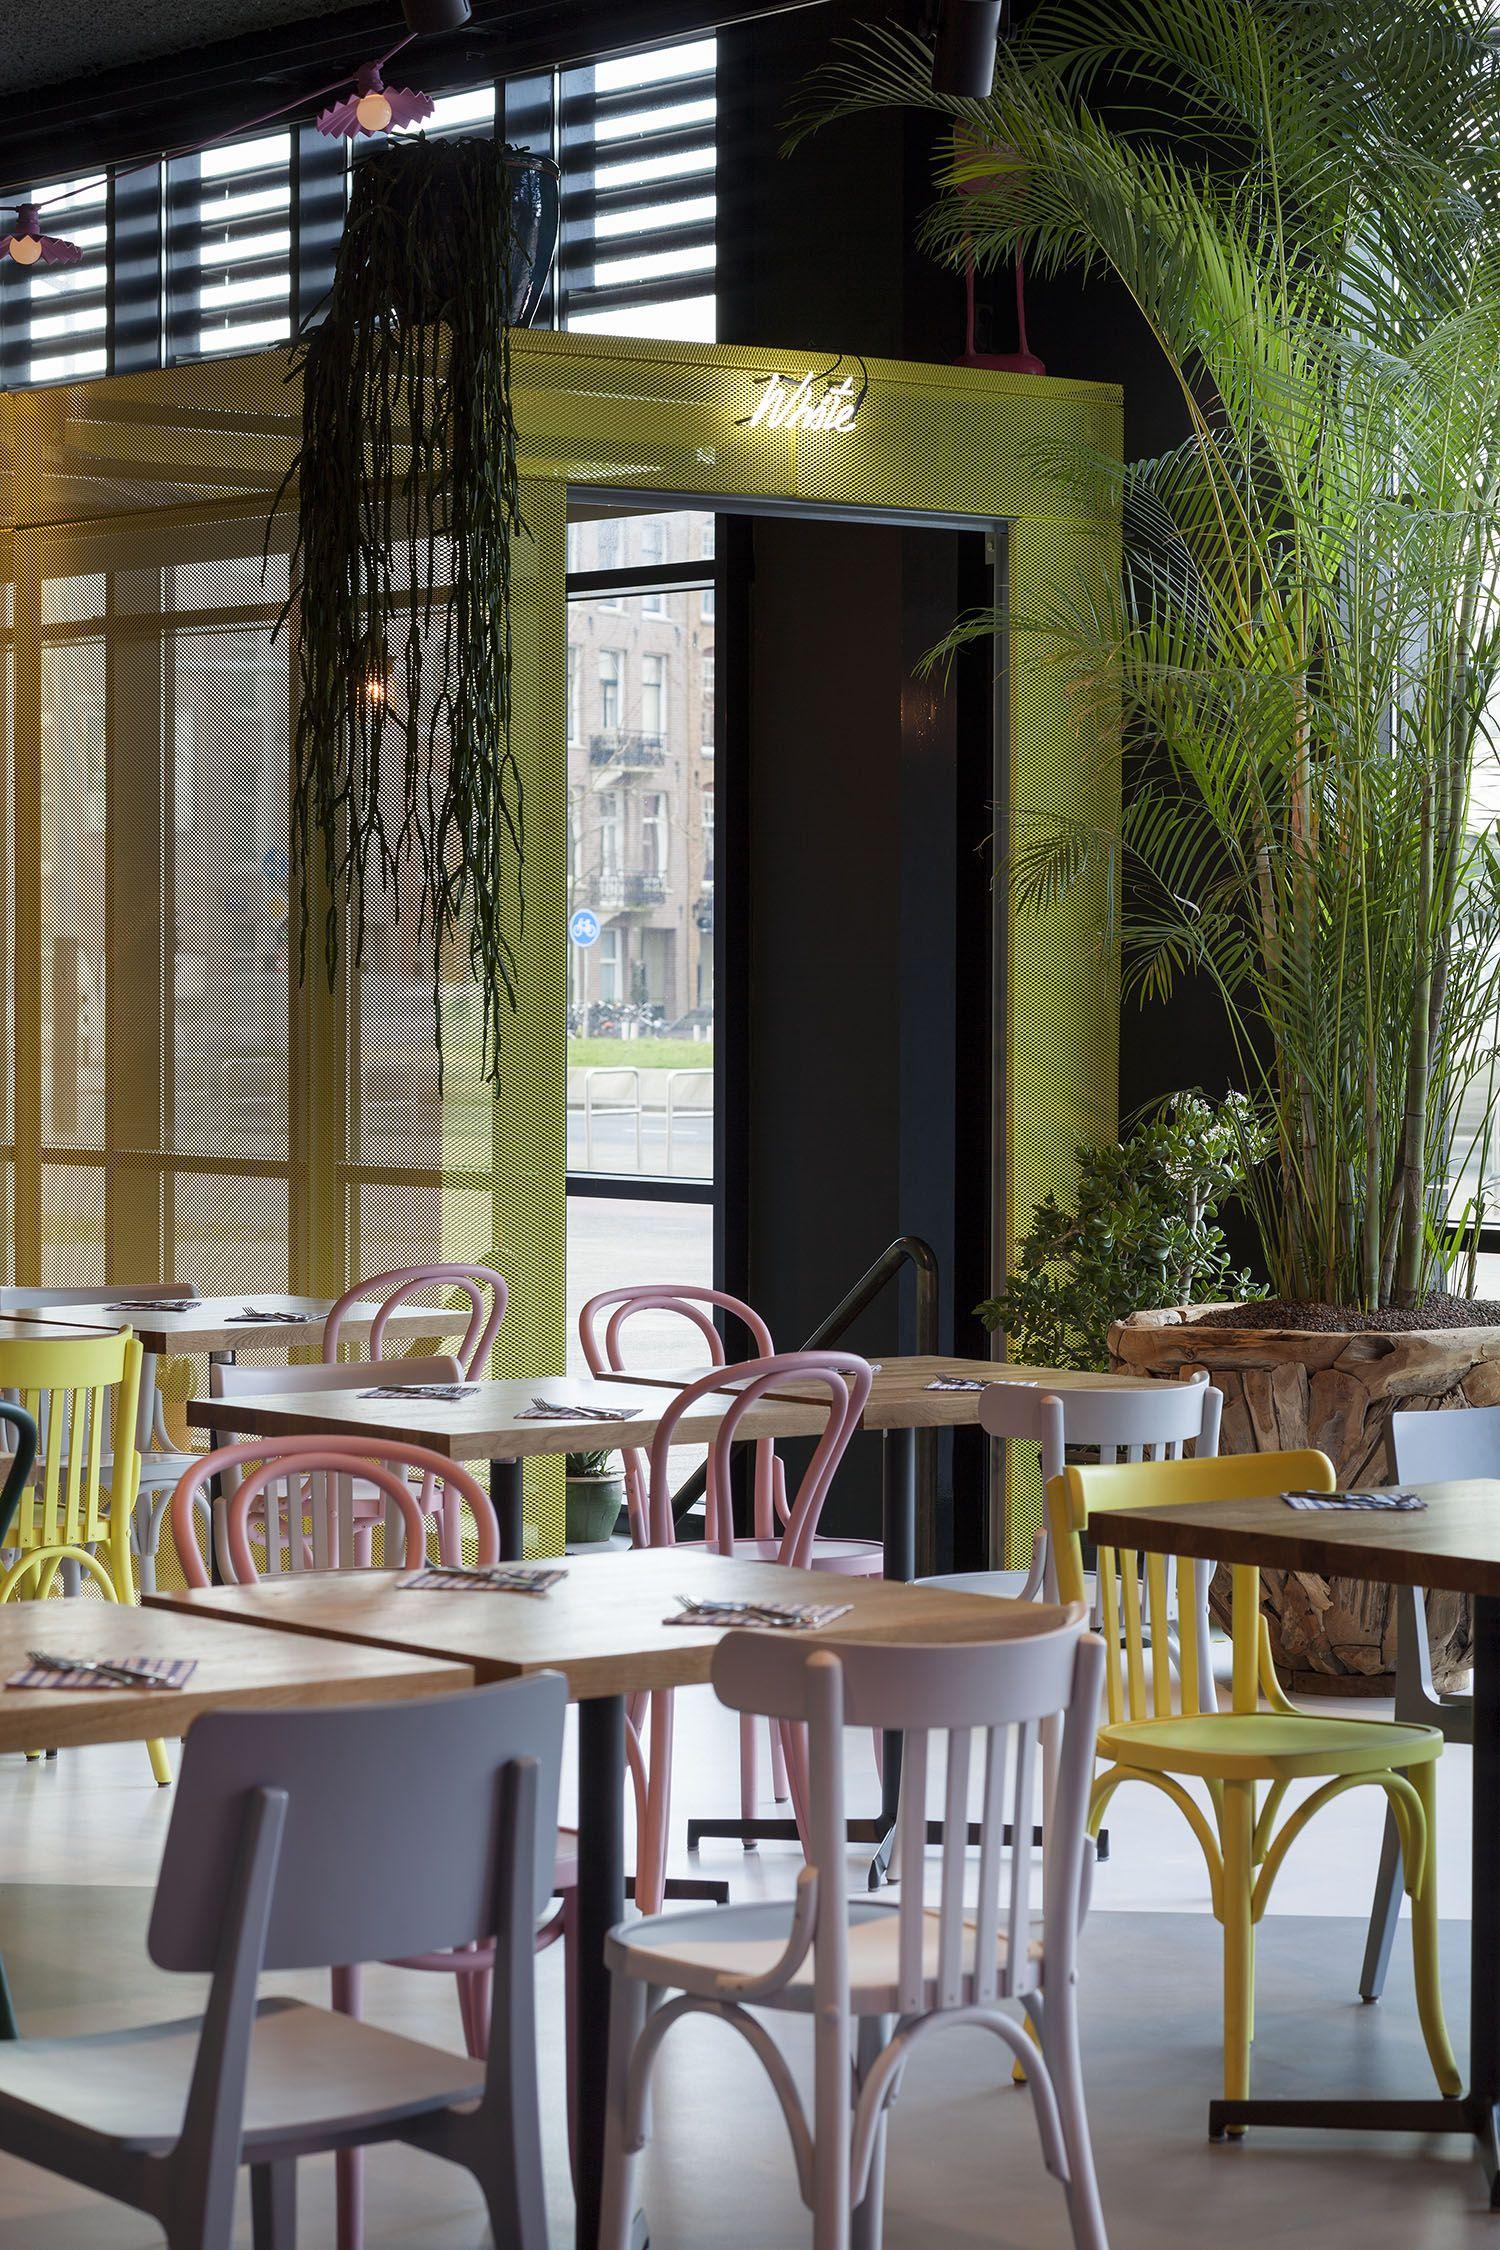 Interior design restaurant The Pool Amsterdam; design by Ninetynine ...